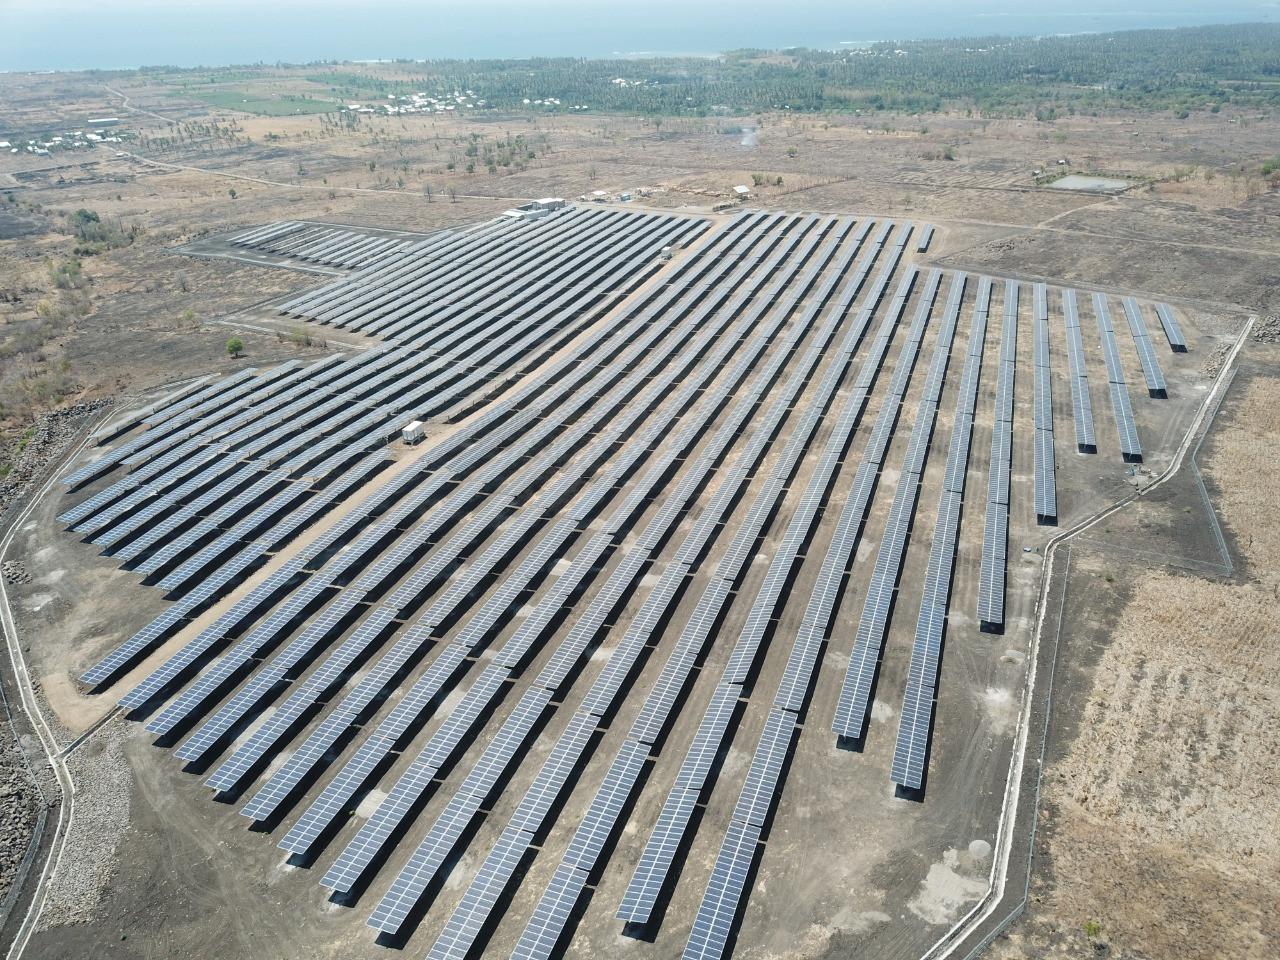 ASEAN's energy future landscape post-pandemic